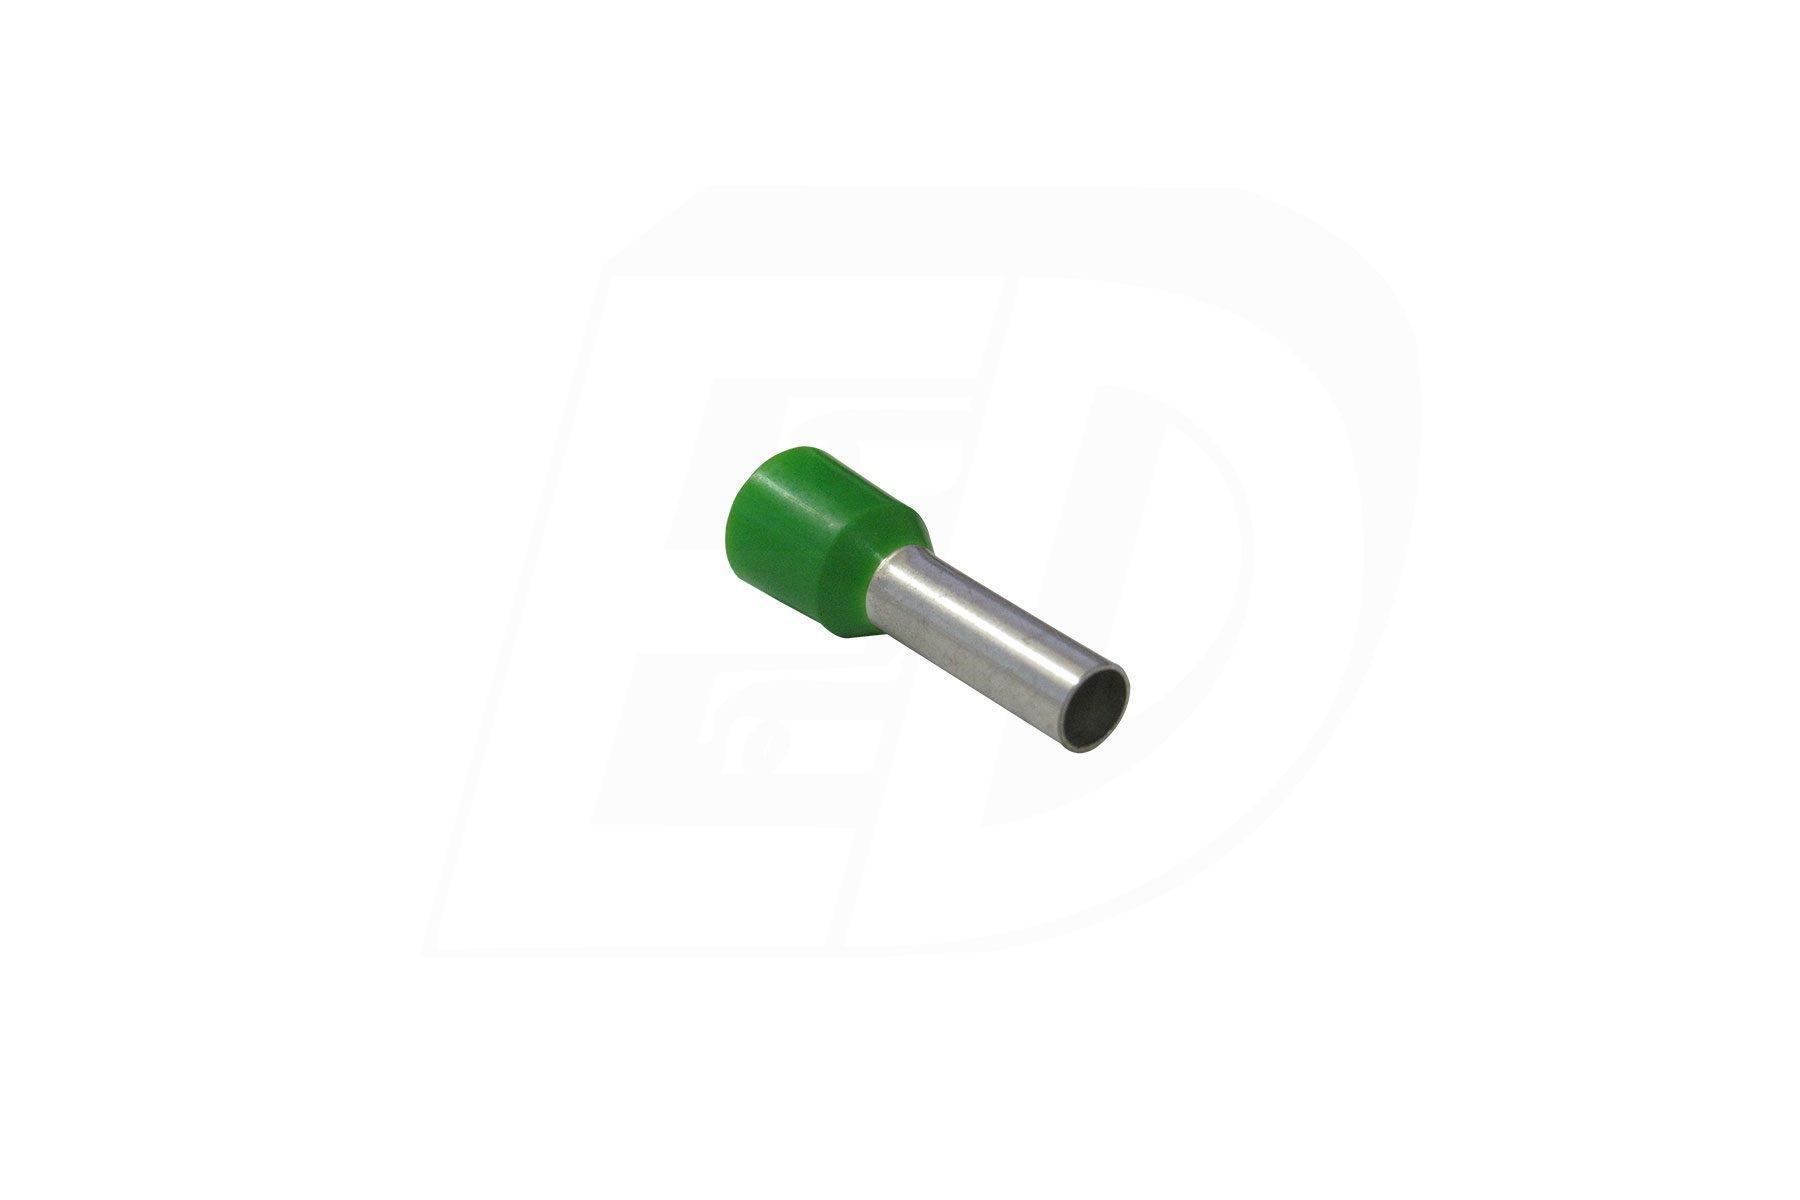 Brazed Seam Nylon Insulated Ferrule Connector 10 AWG